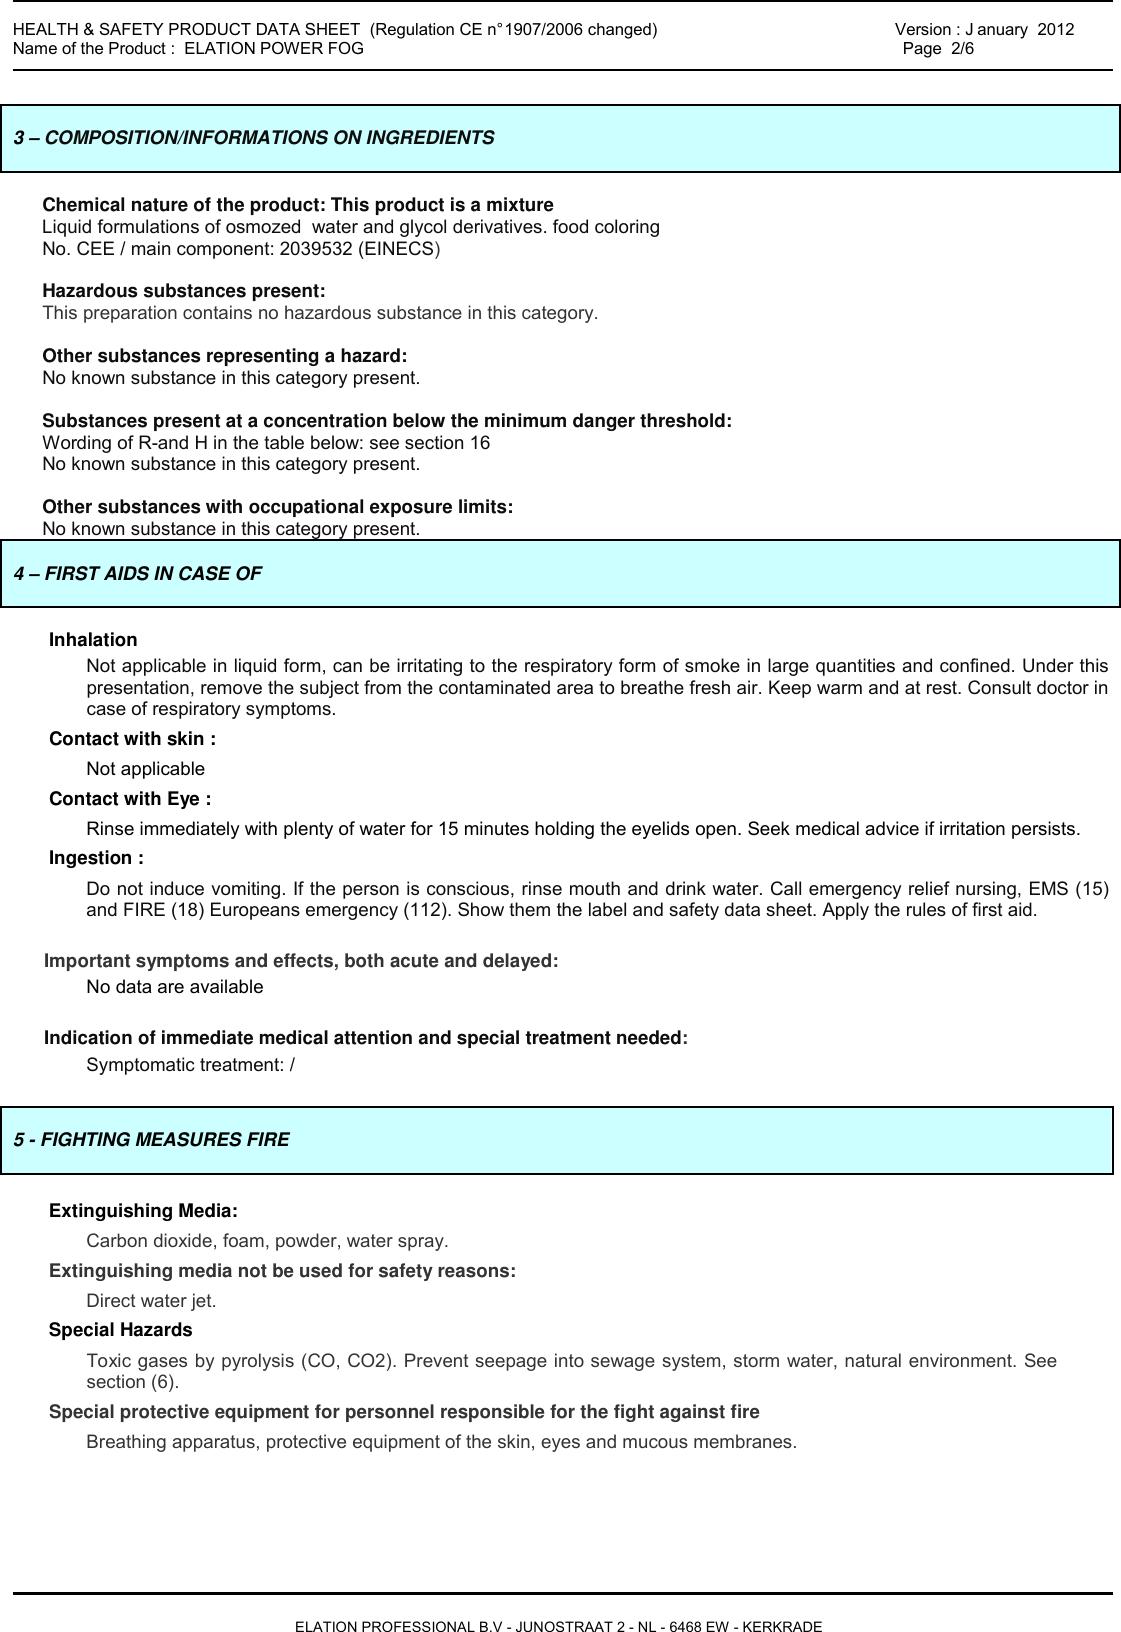 FDS HEALTH & SAFETY DATA SHEET ELATION PROFESSIONAL POWER FOG